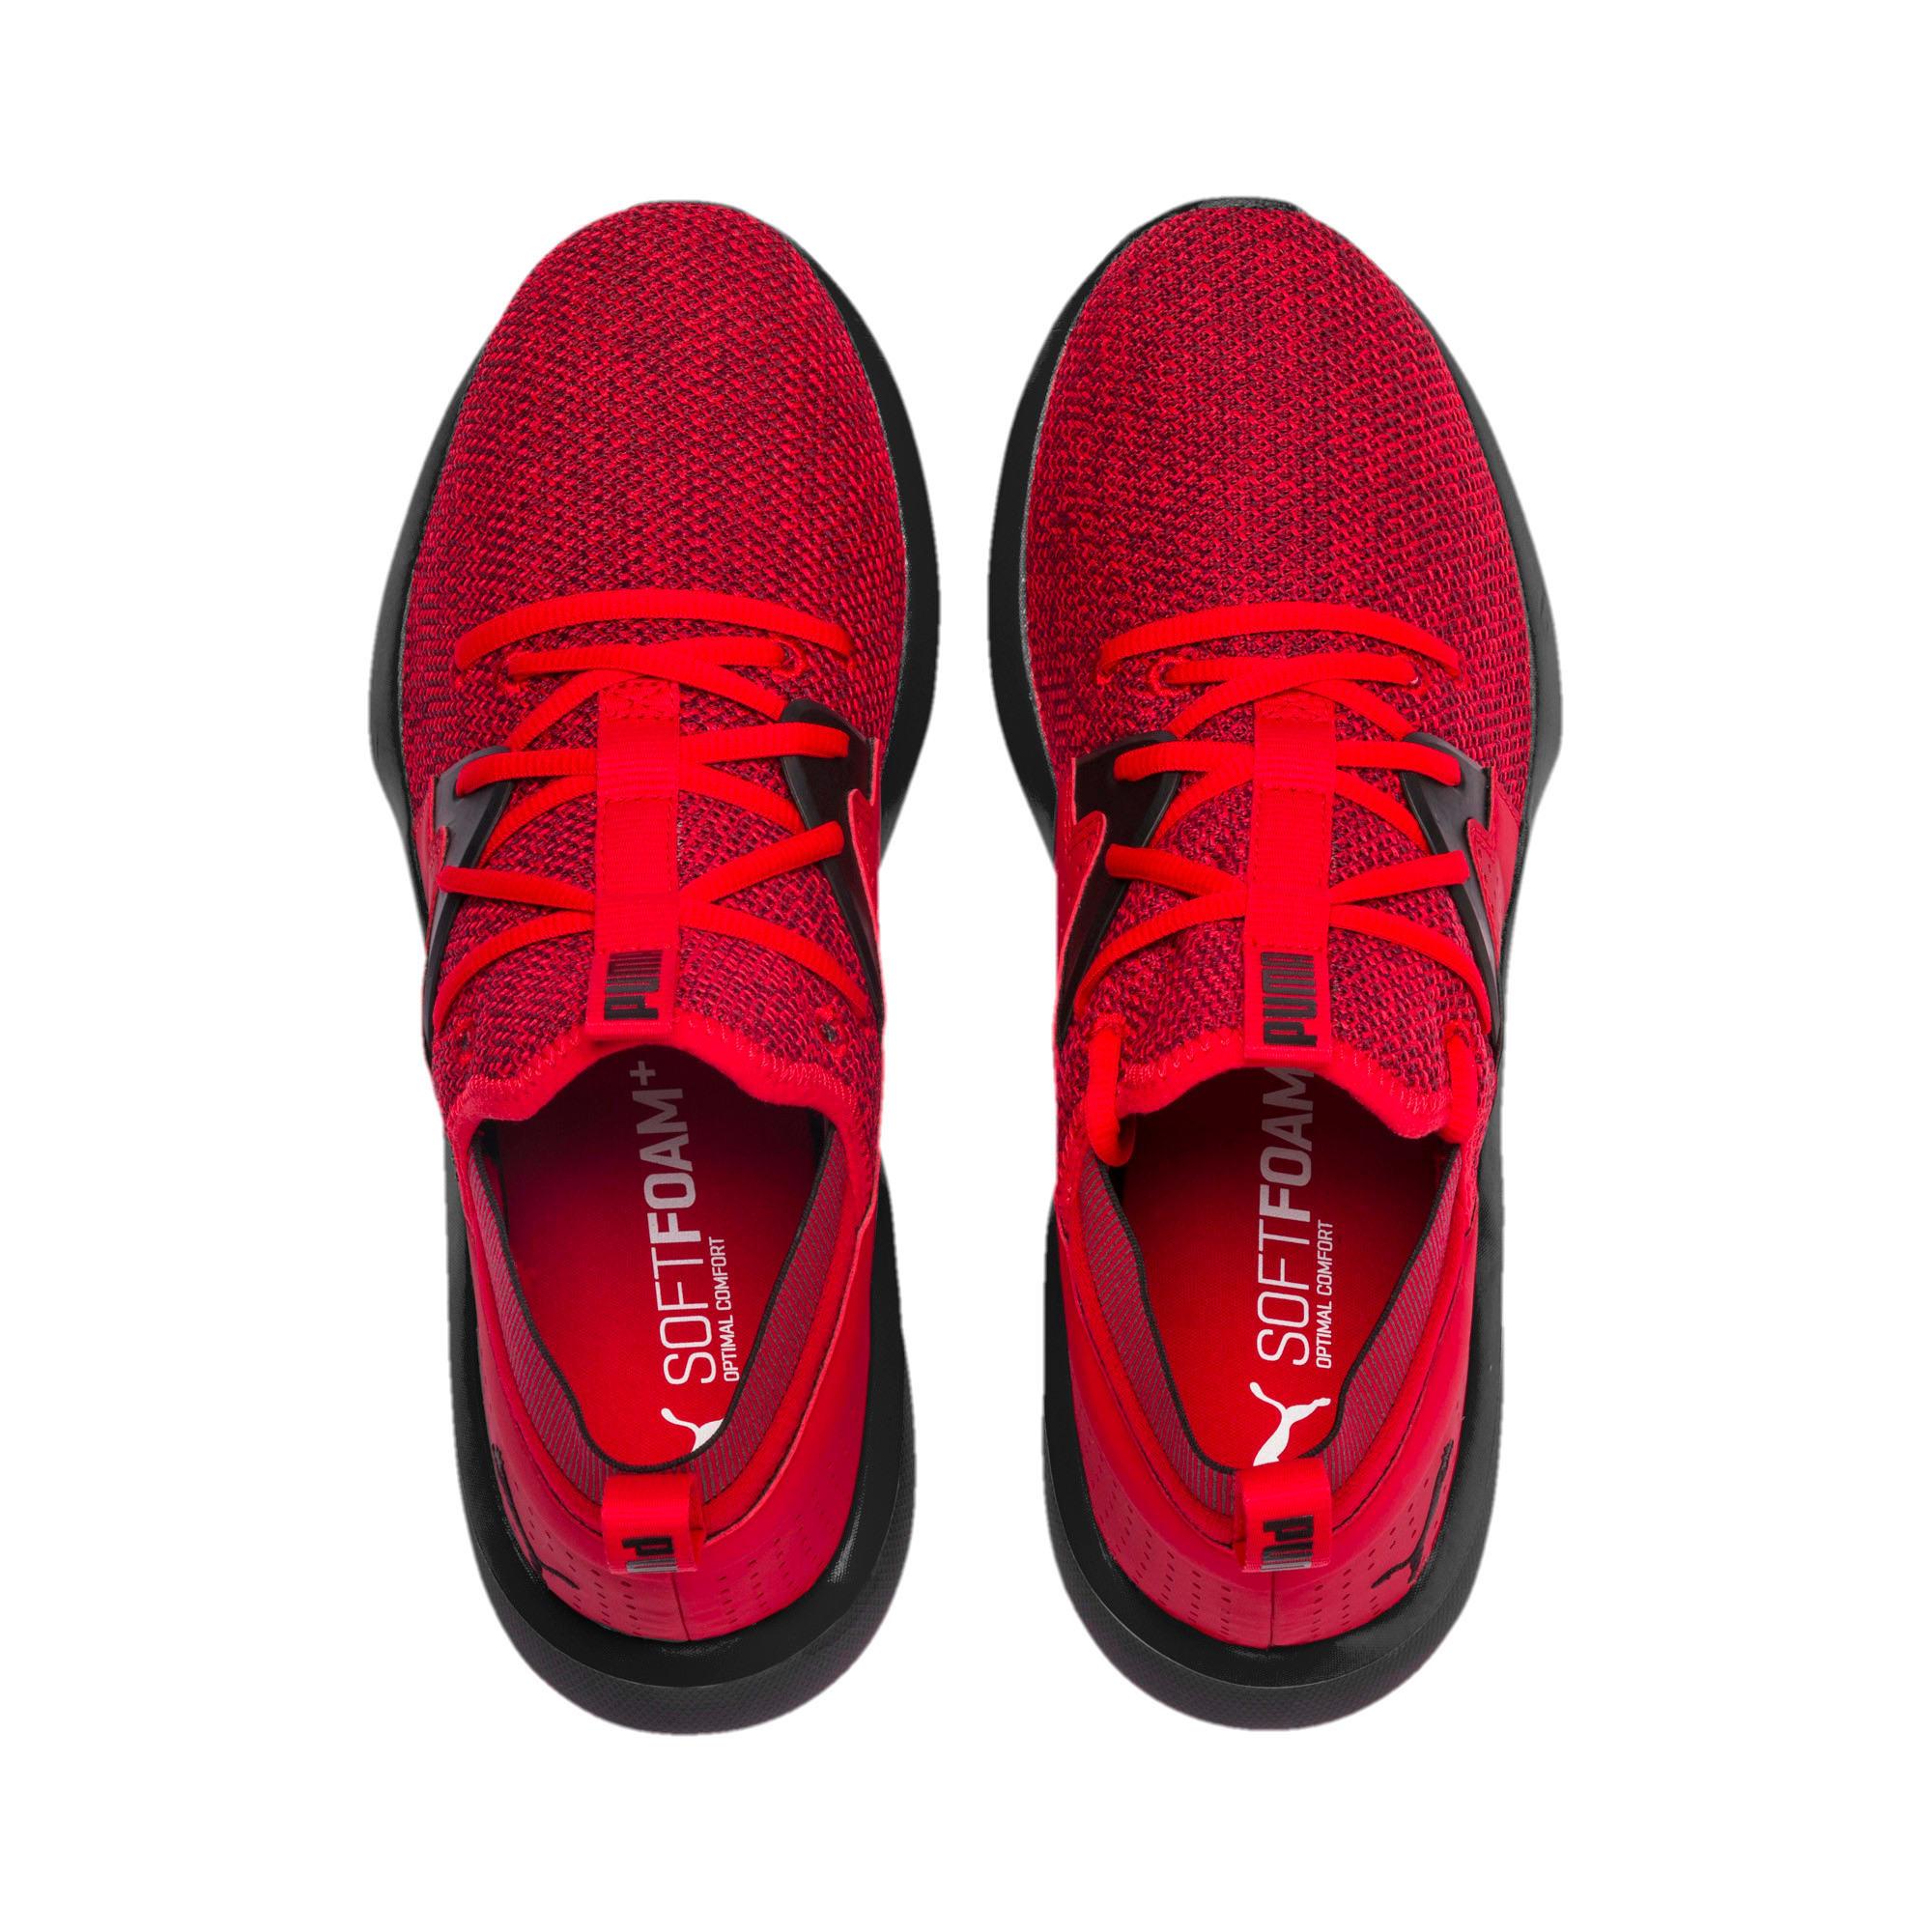 Thumbnail 2 of Emergence Men's Running Shoes, High Risk Red-Puma Black, medium-IND